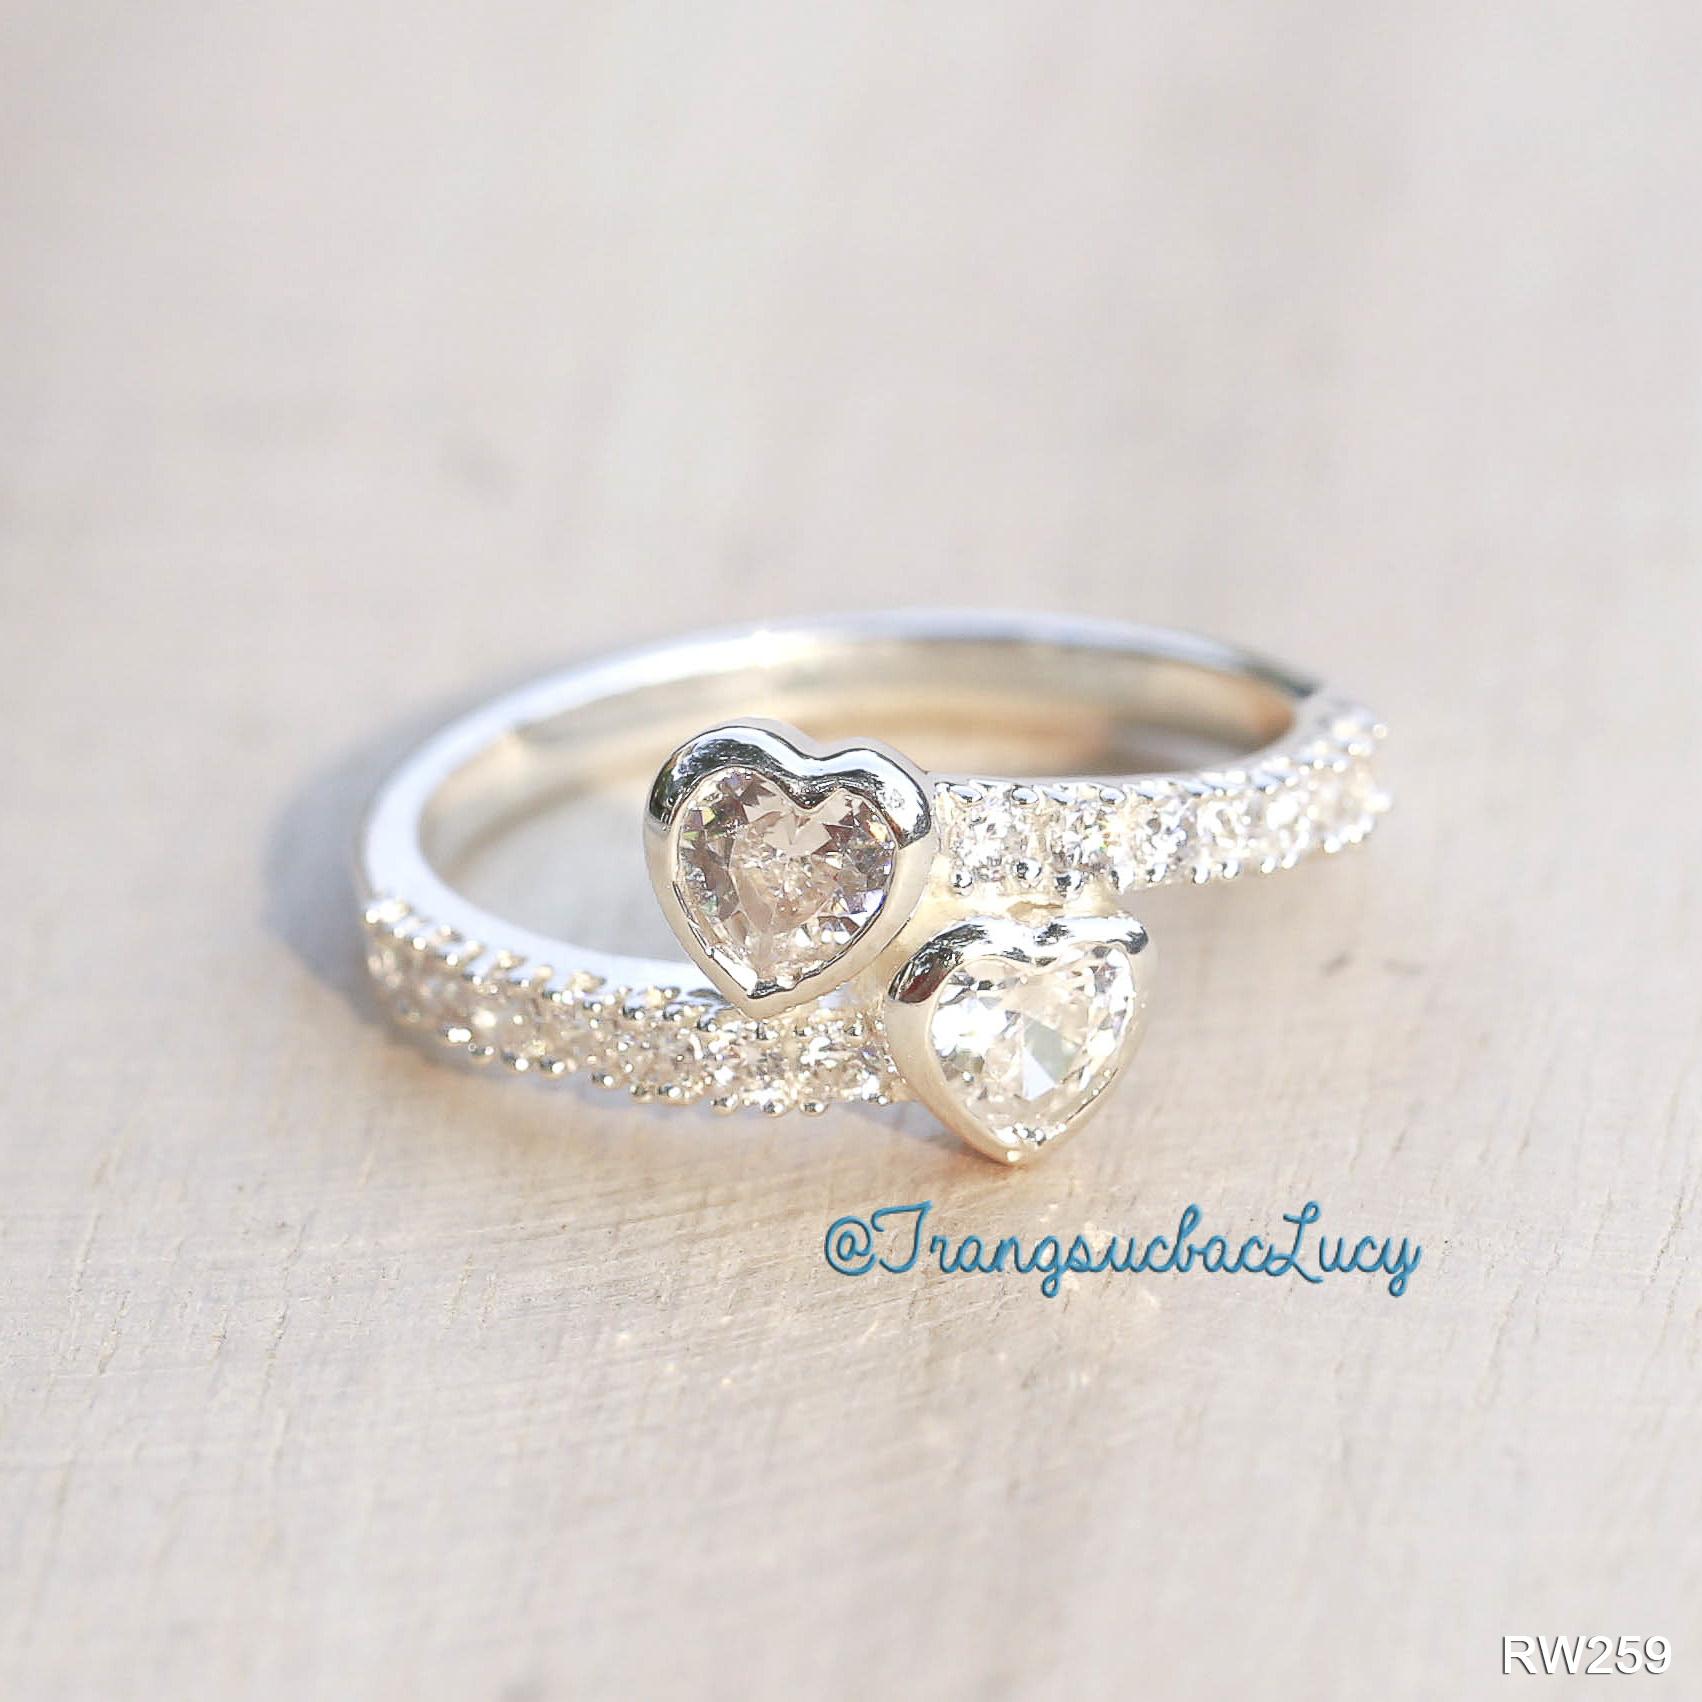 Nhẫn nữ bạc lucy - rw259